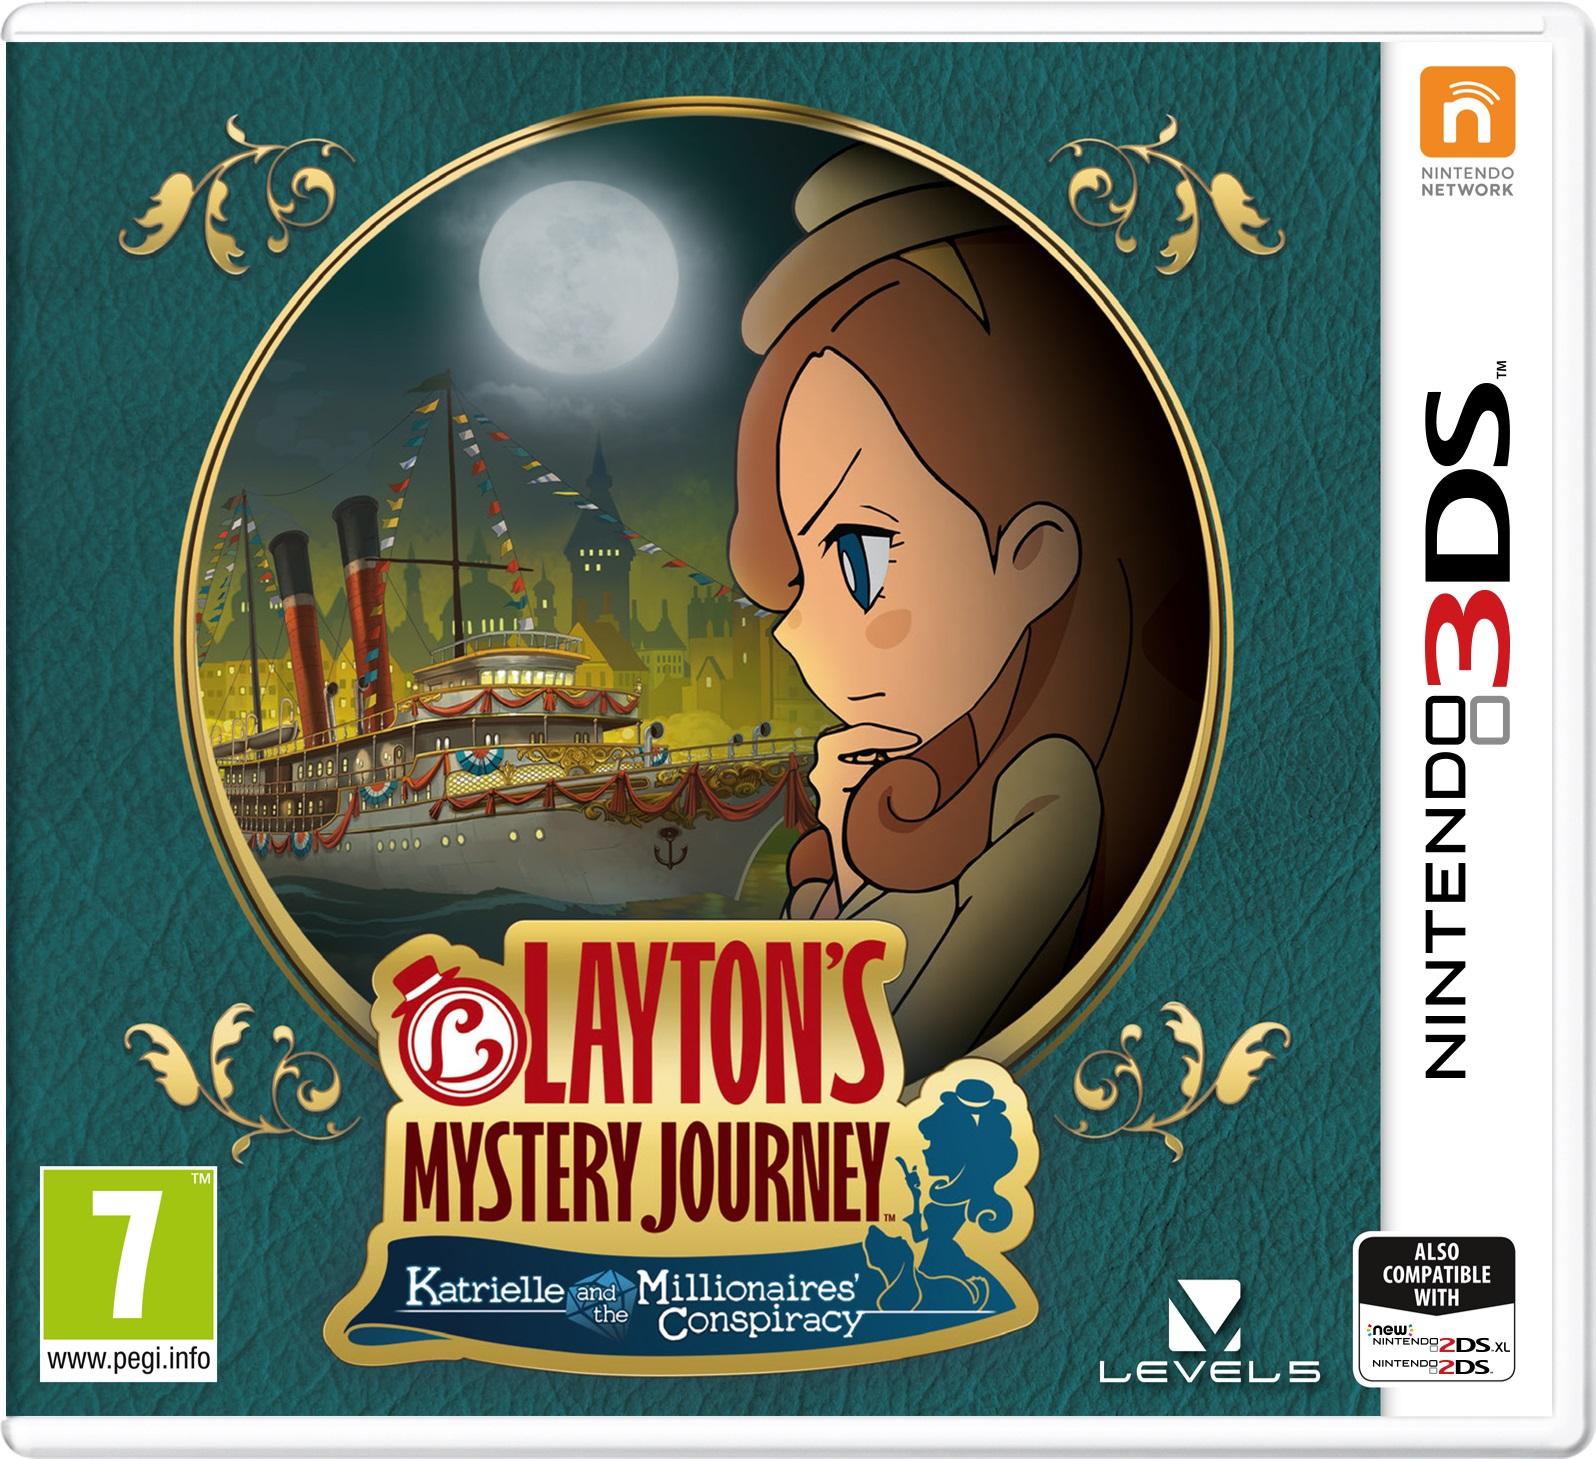 Laytons Mystery Journey EU Boxart Nintendo Everything